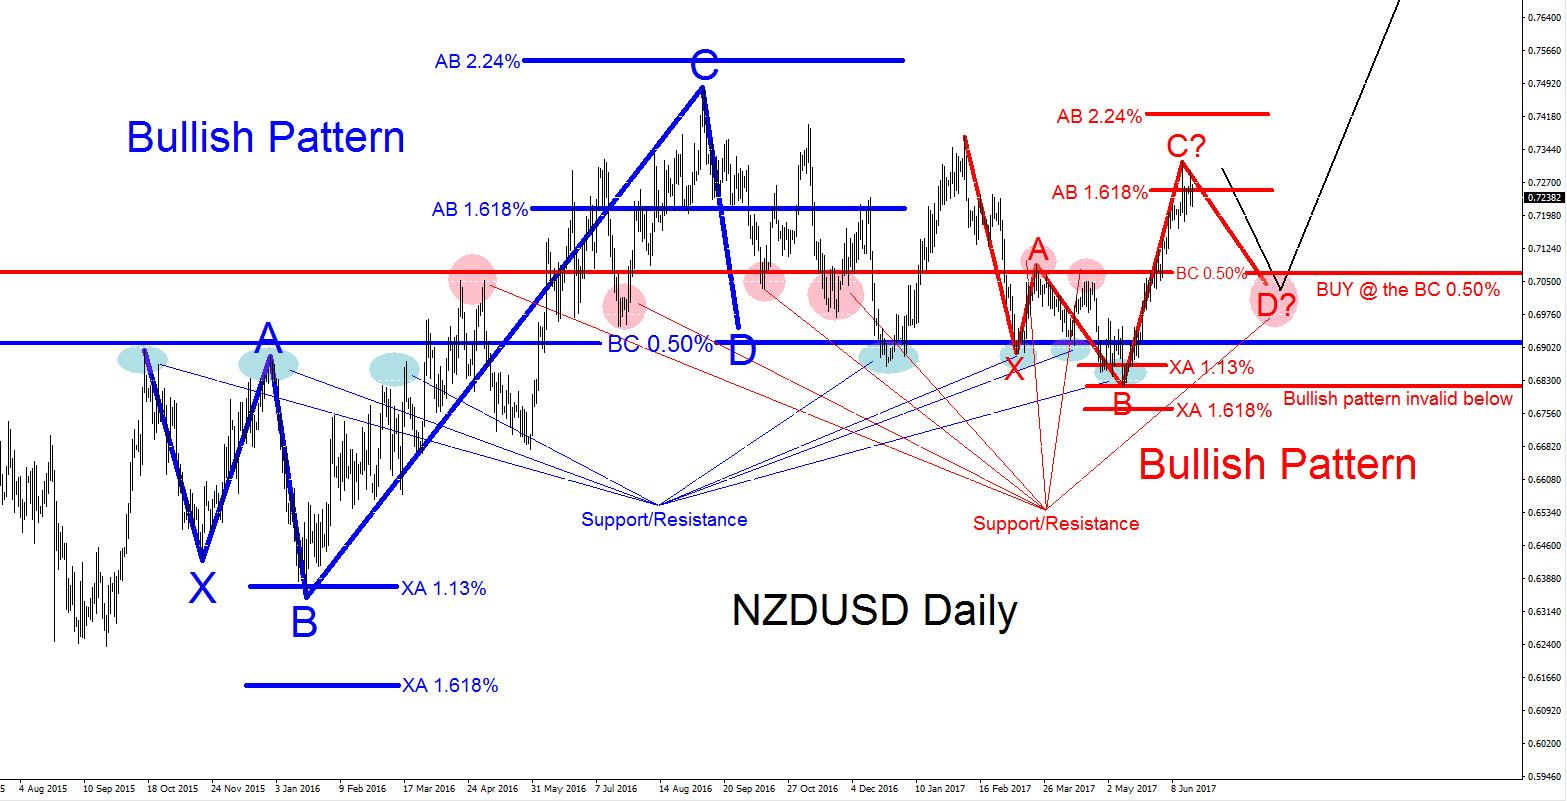 NZDUSD : Wait for Pullback then Buy Again